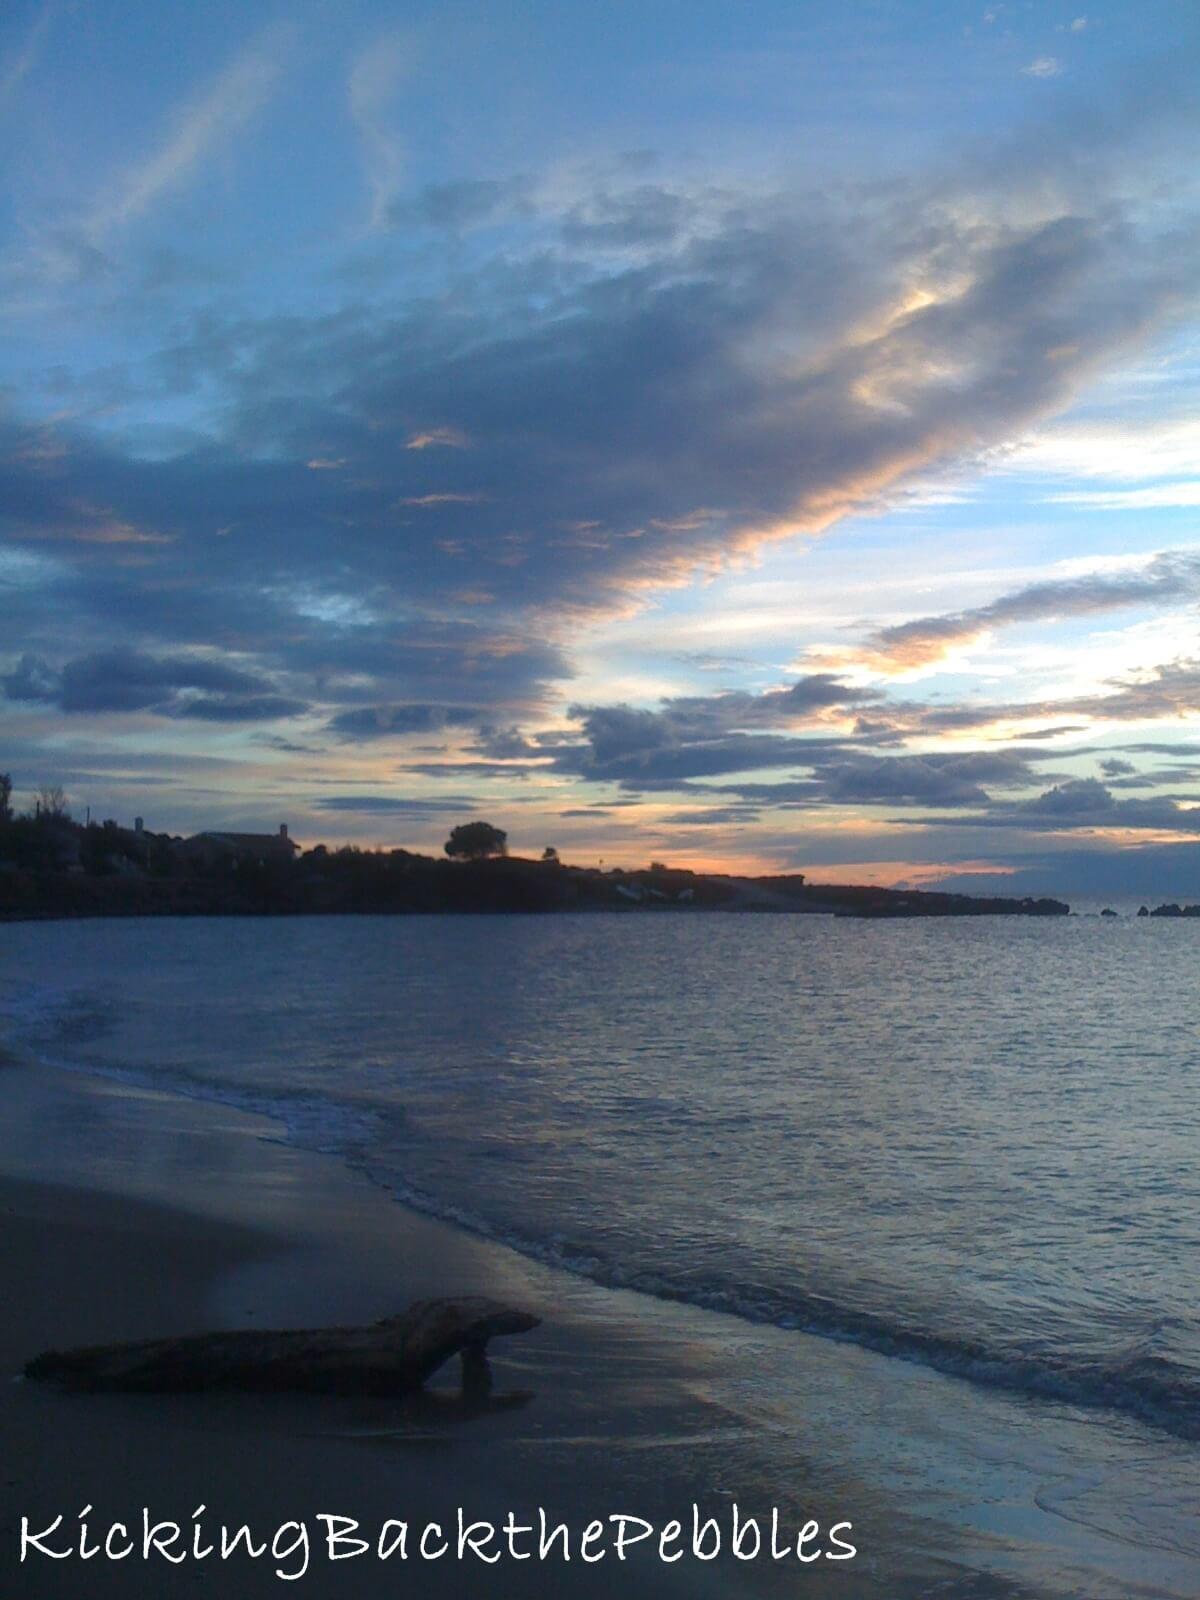 Winter Beaches |Kicking Back the Pebbles